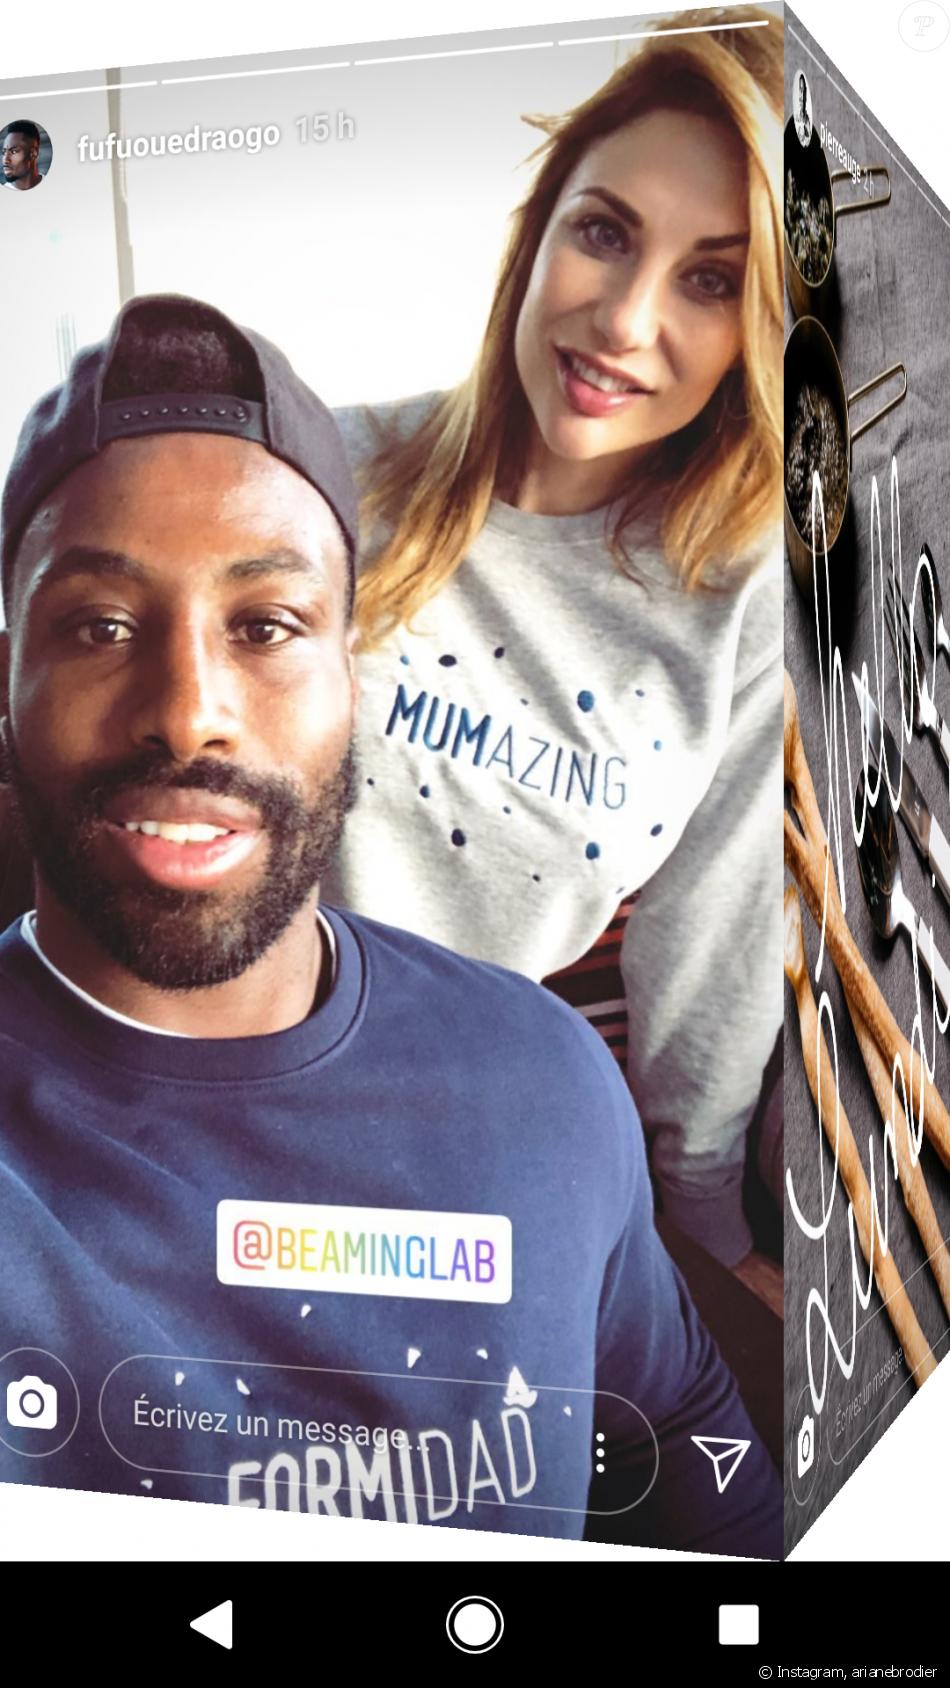 Ariane Brodier et son compagnon Fulgence heureux parents, 11 mars 2018, Instagram